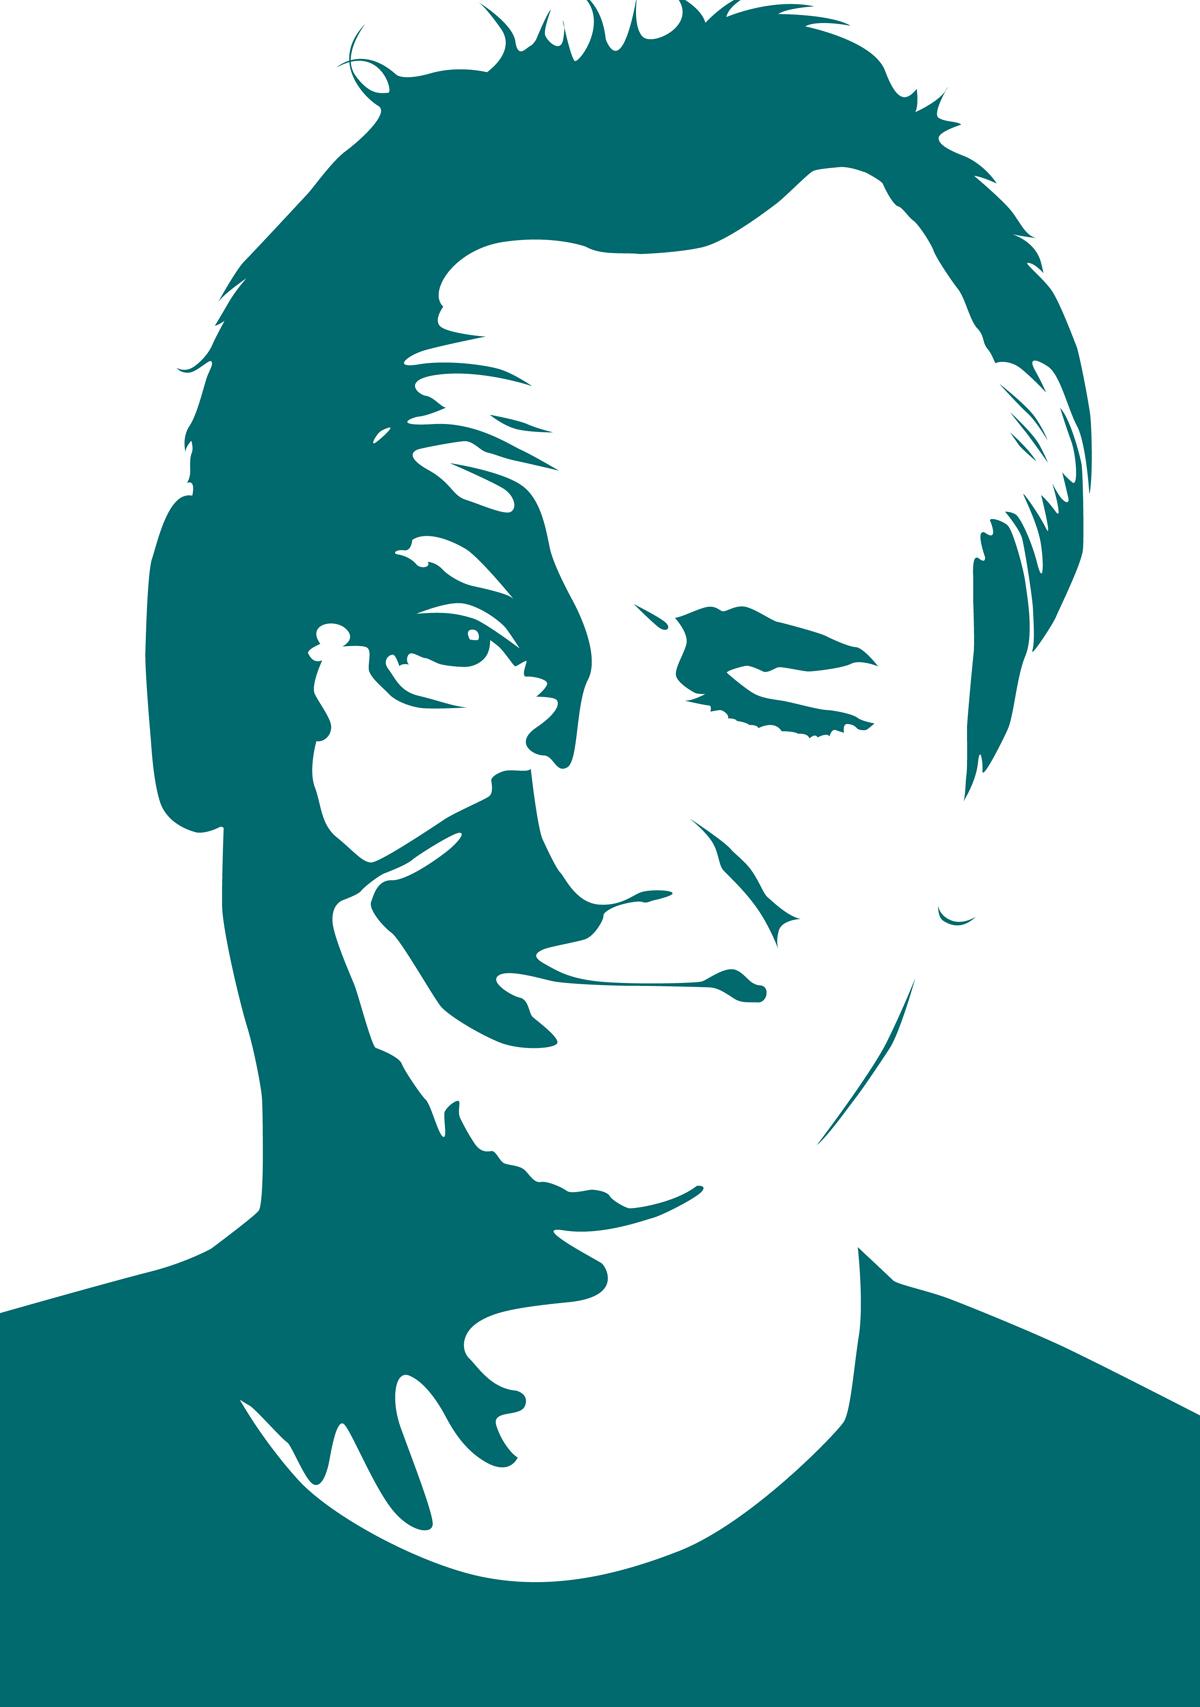 Bill Murray KCCO Wallpaper 1200x1707